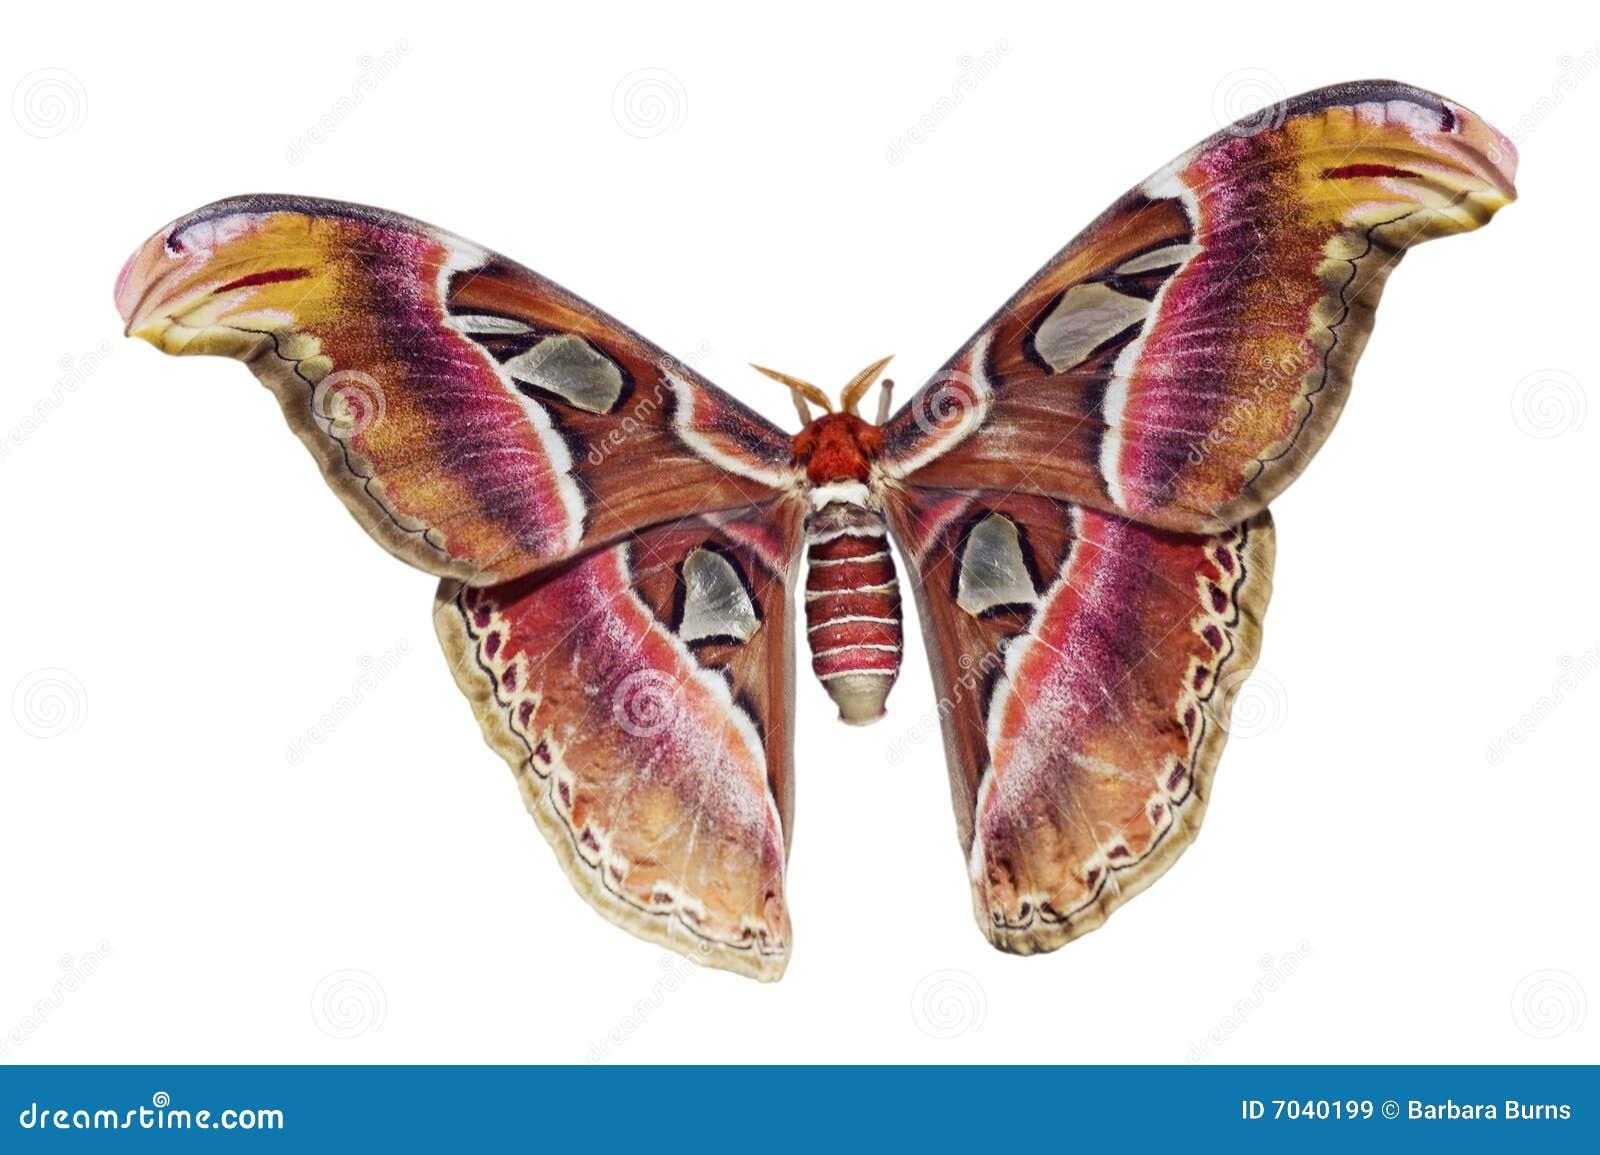 Giant Atlas Moth Cutout